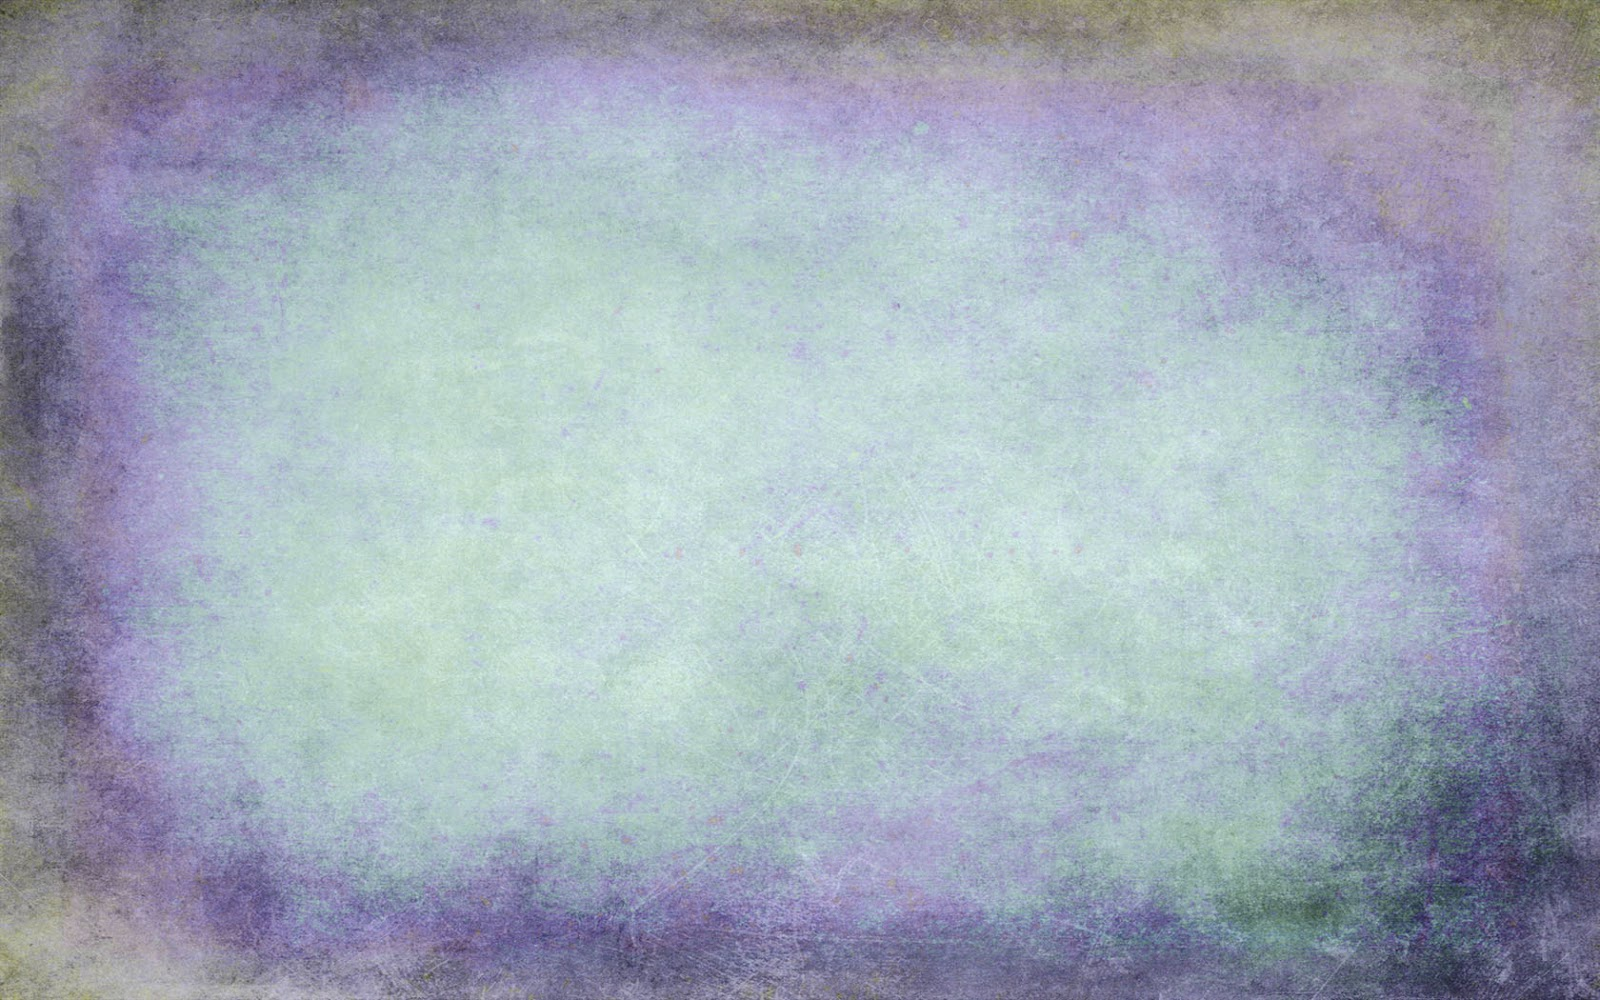 tumblr backgrounds romantic background true blue tumblr backgrounds 1600x1000